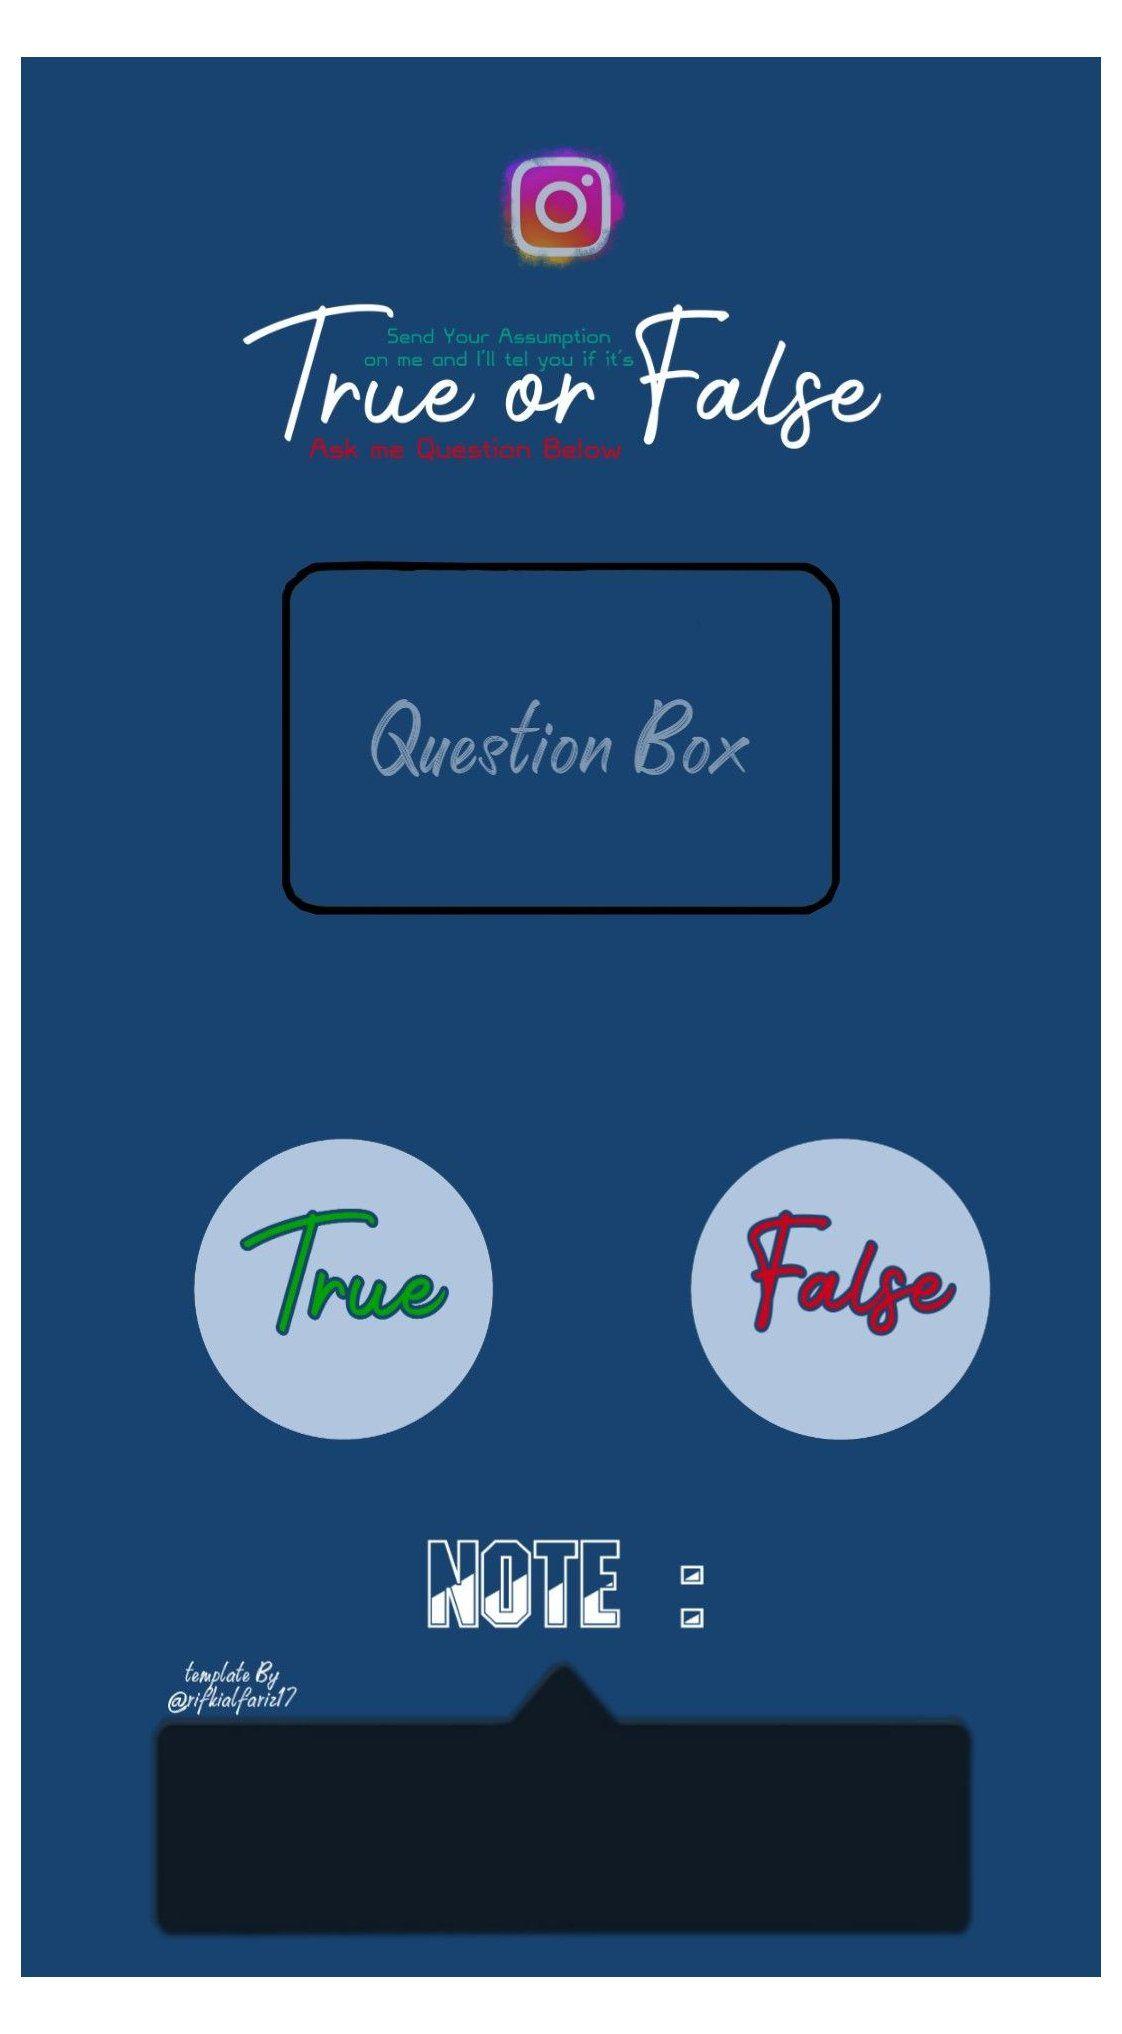 Ig Story Template True Or False Igstorytemplatetrueorfalse In 2021 Instagram Questions Question Box Instagram Story Template Instagram Story Template True or false quiz template